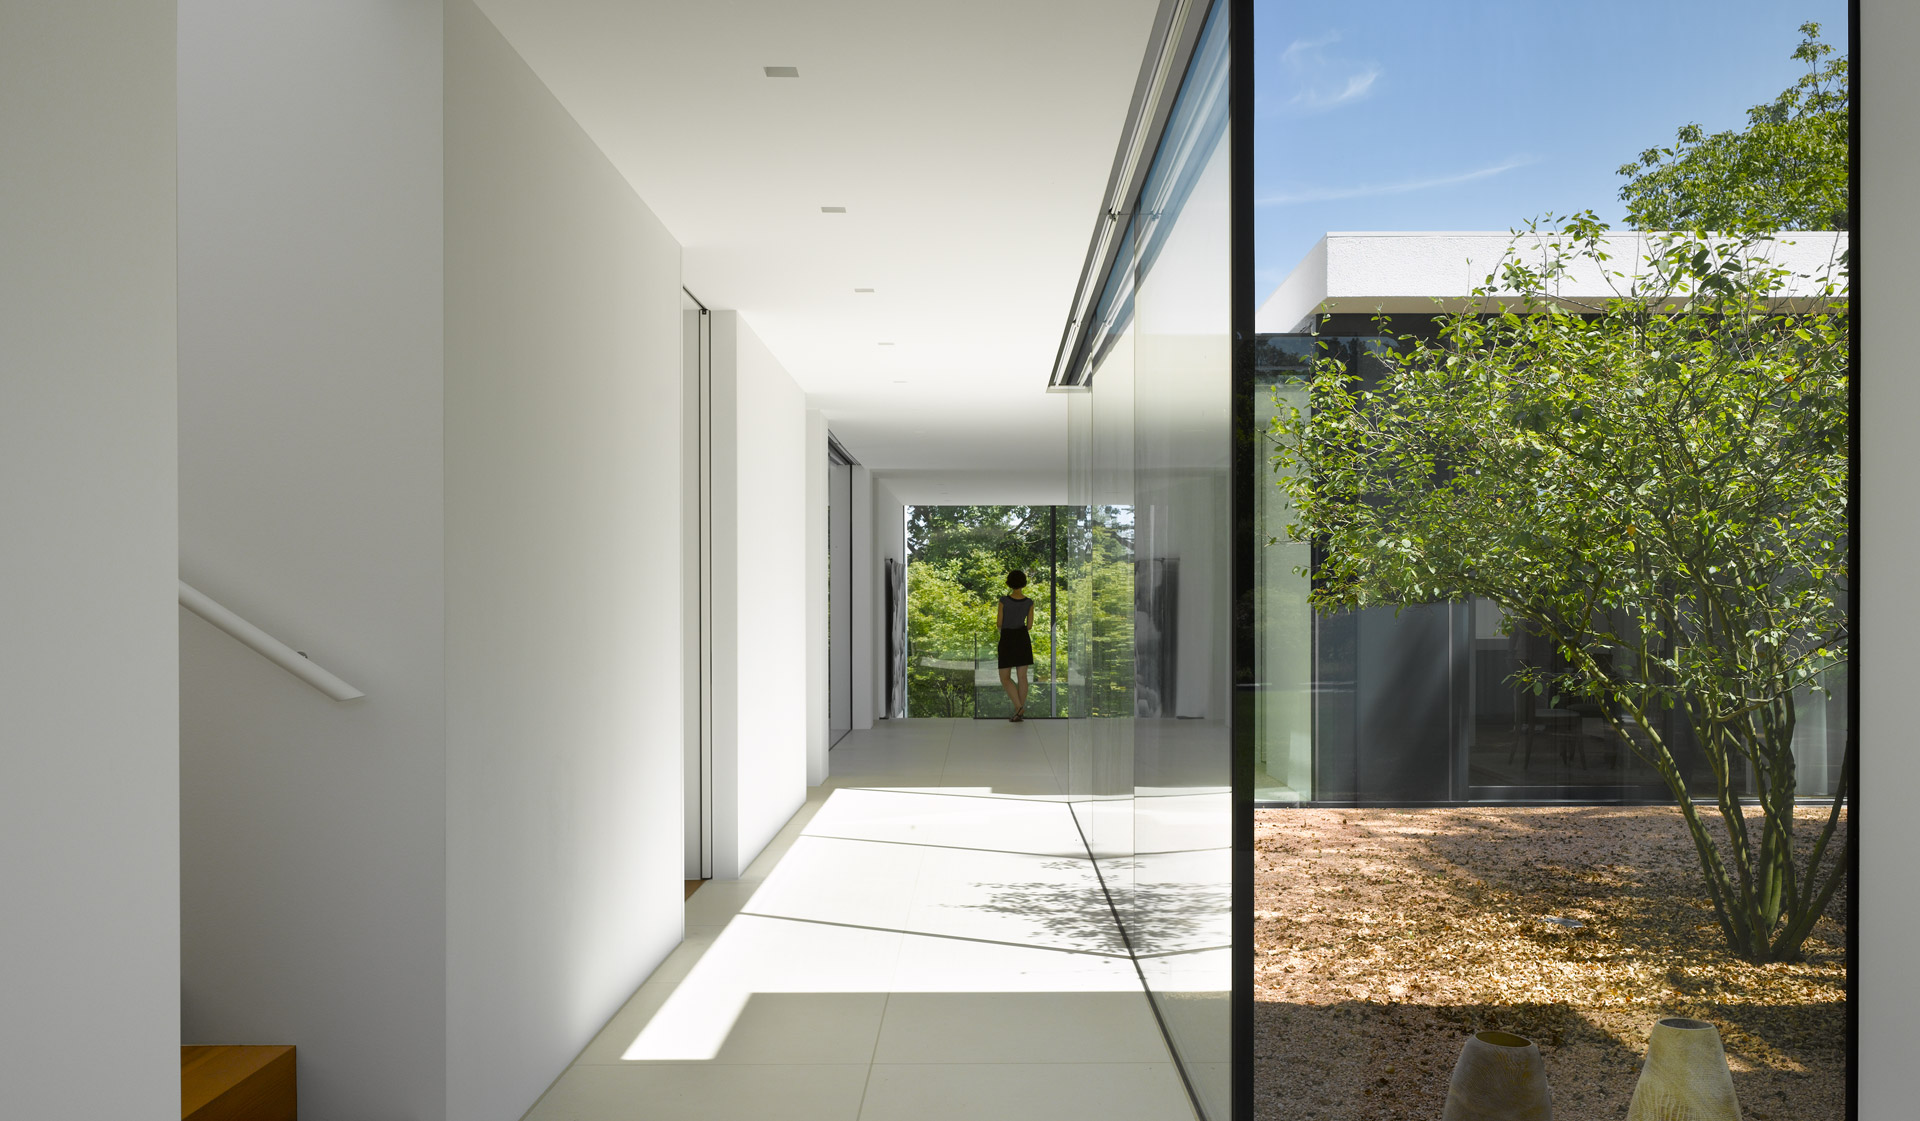 PavillonVilla in Bayern Weber Hummel Architekten 7